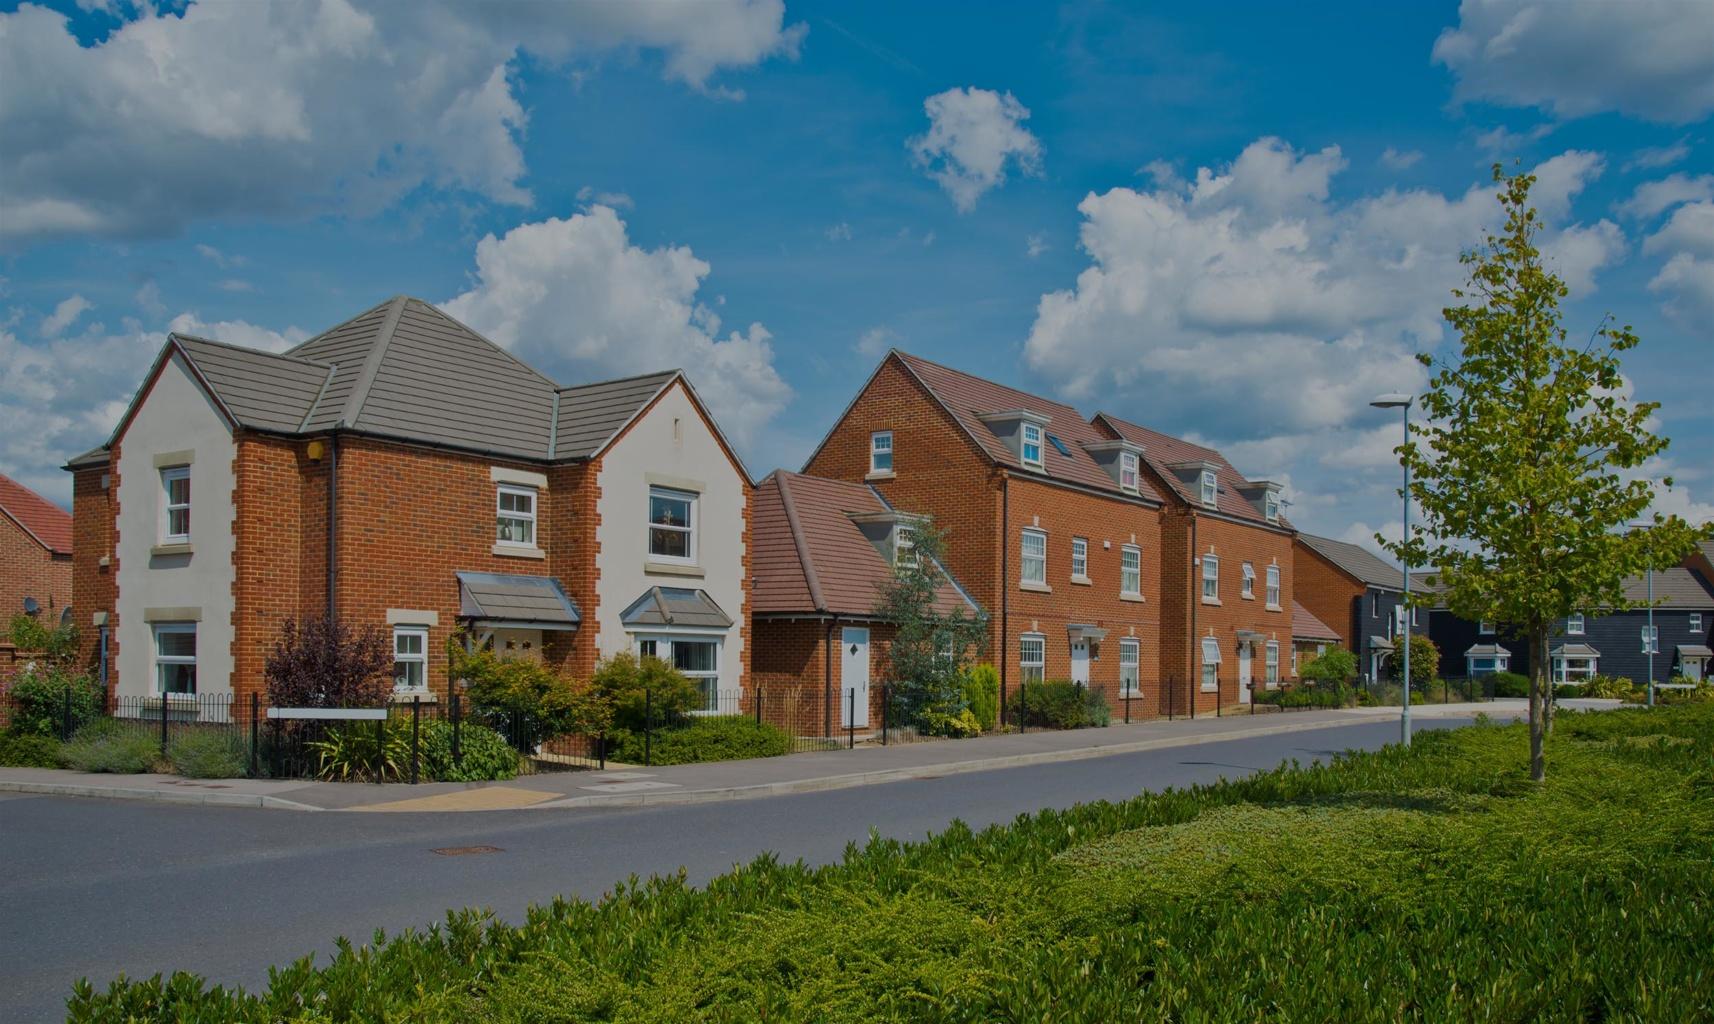 Heckford Housing Marketing